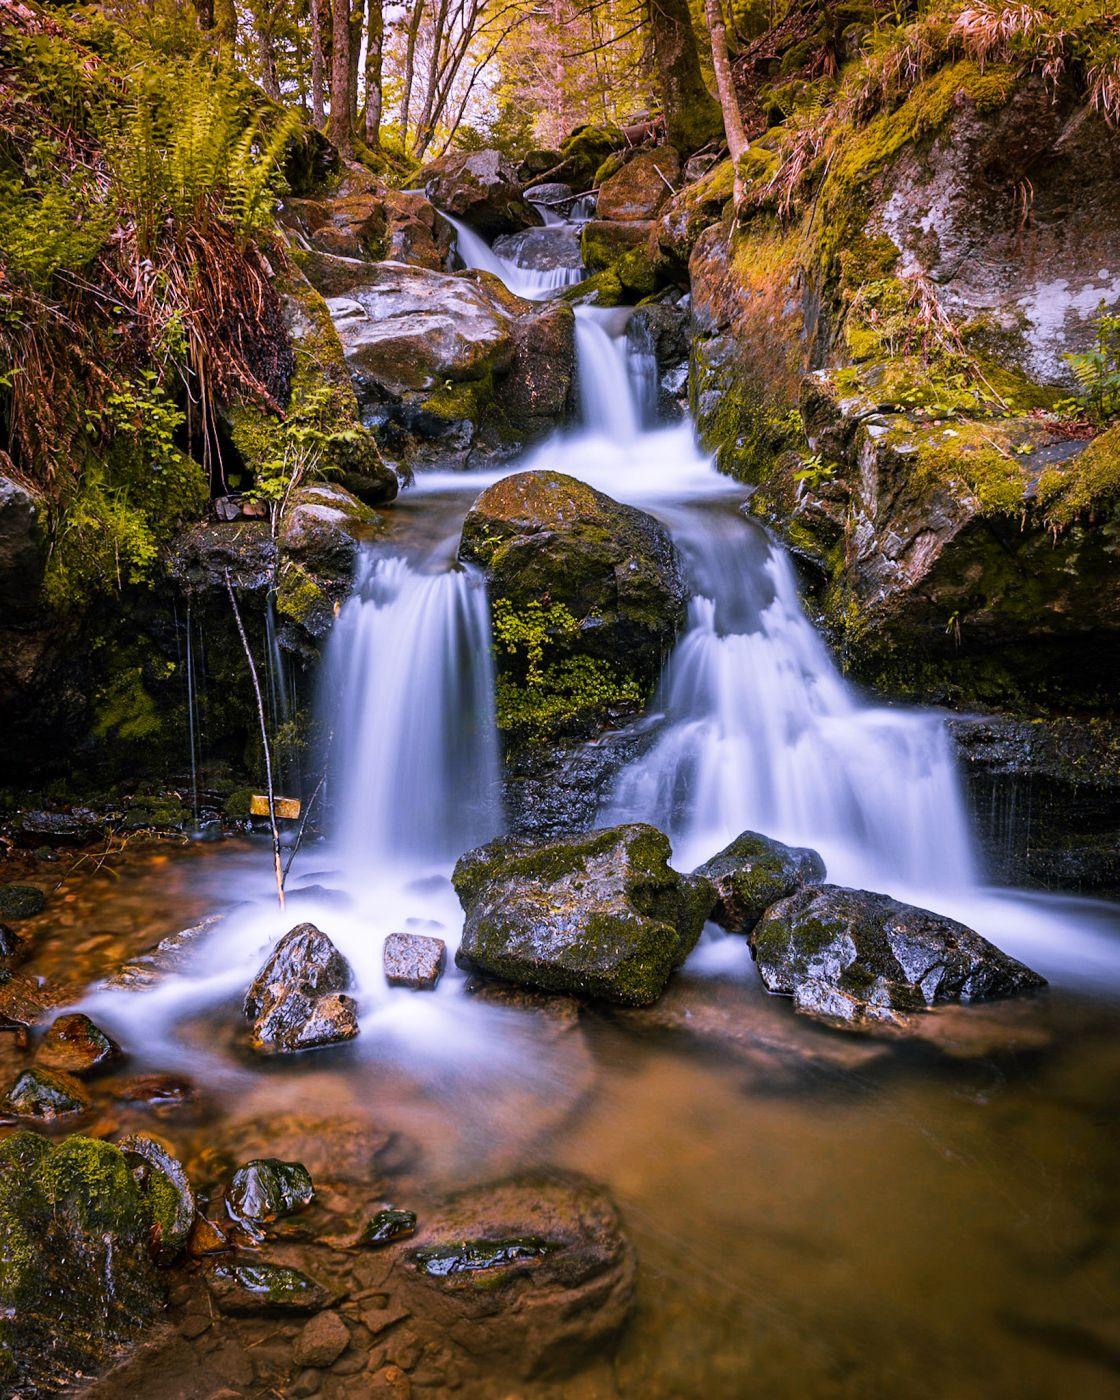 Todtnau Waterfall, Germany